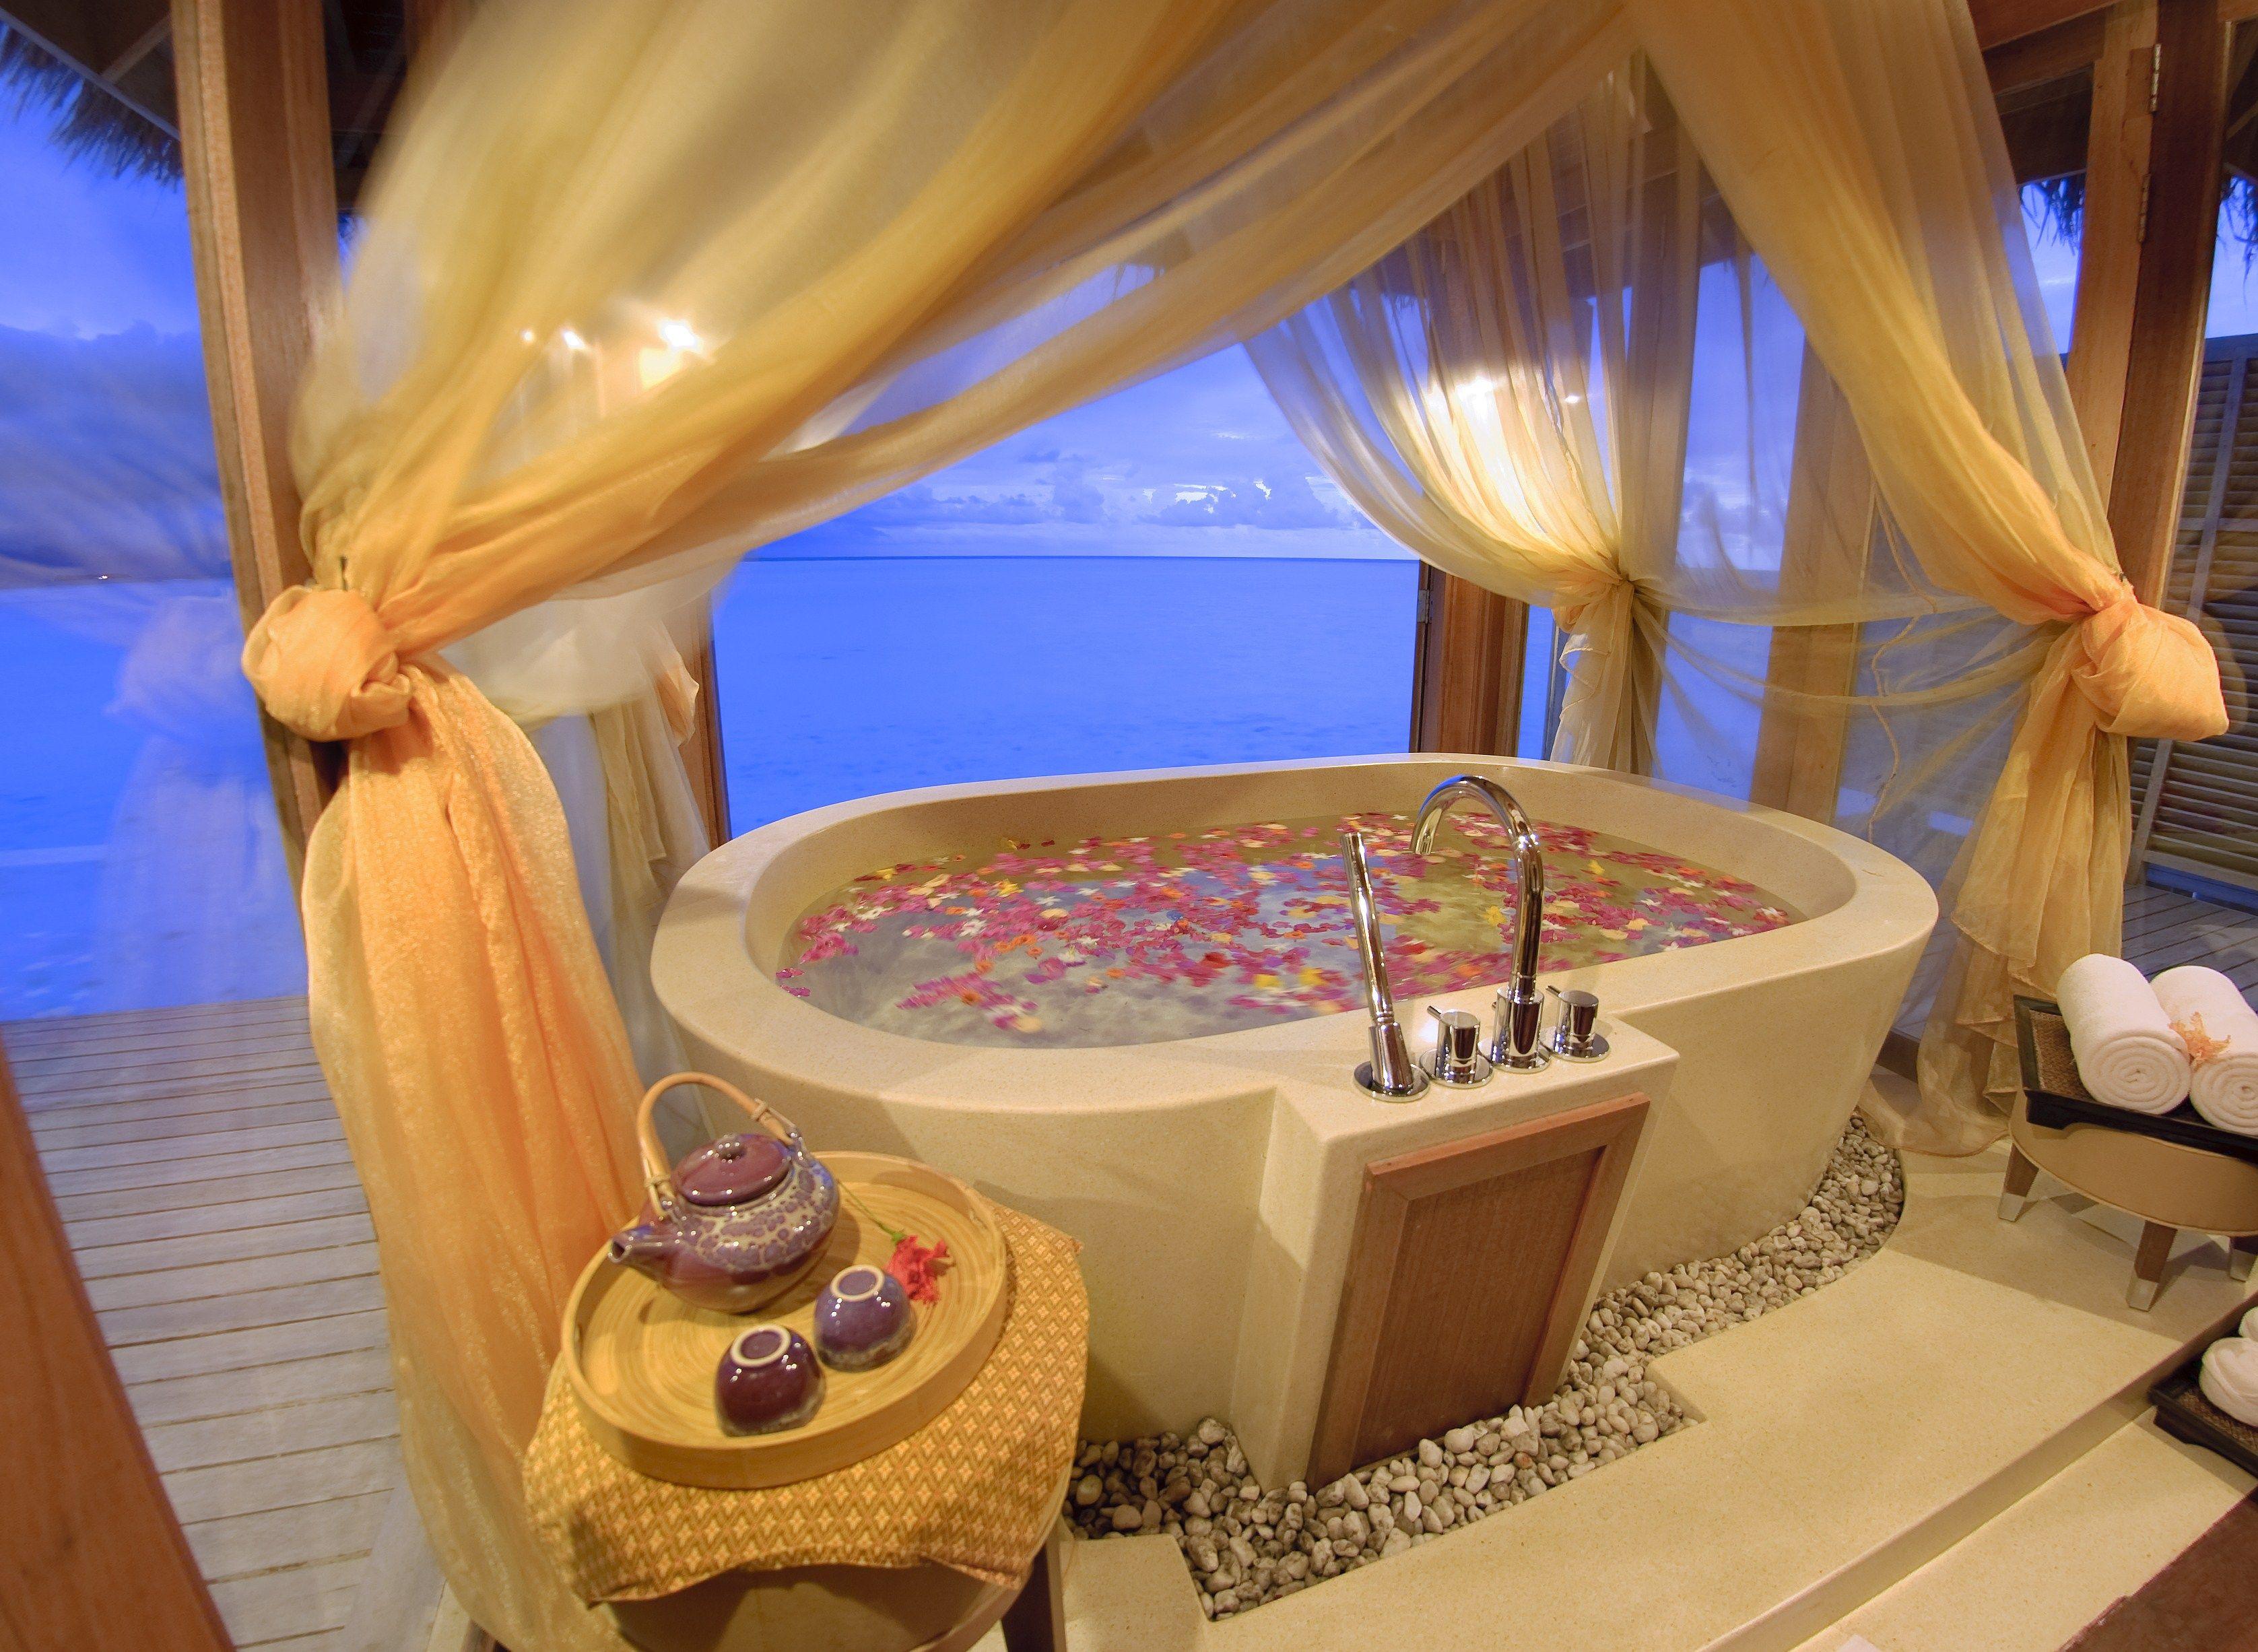 The Maldives and a romantic outdoor over water villa bungalow bathtub at the Anantara Dhigu